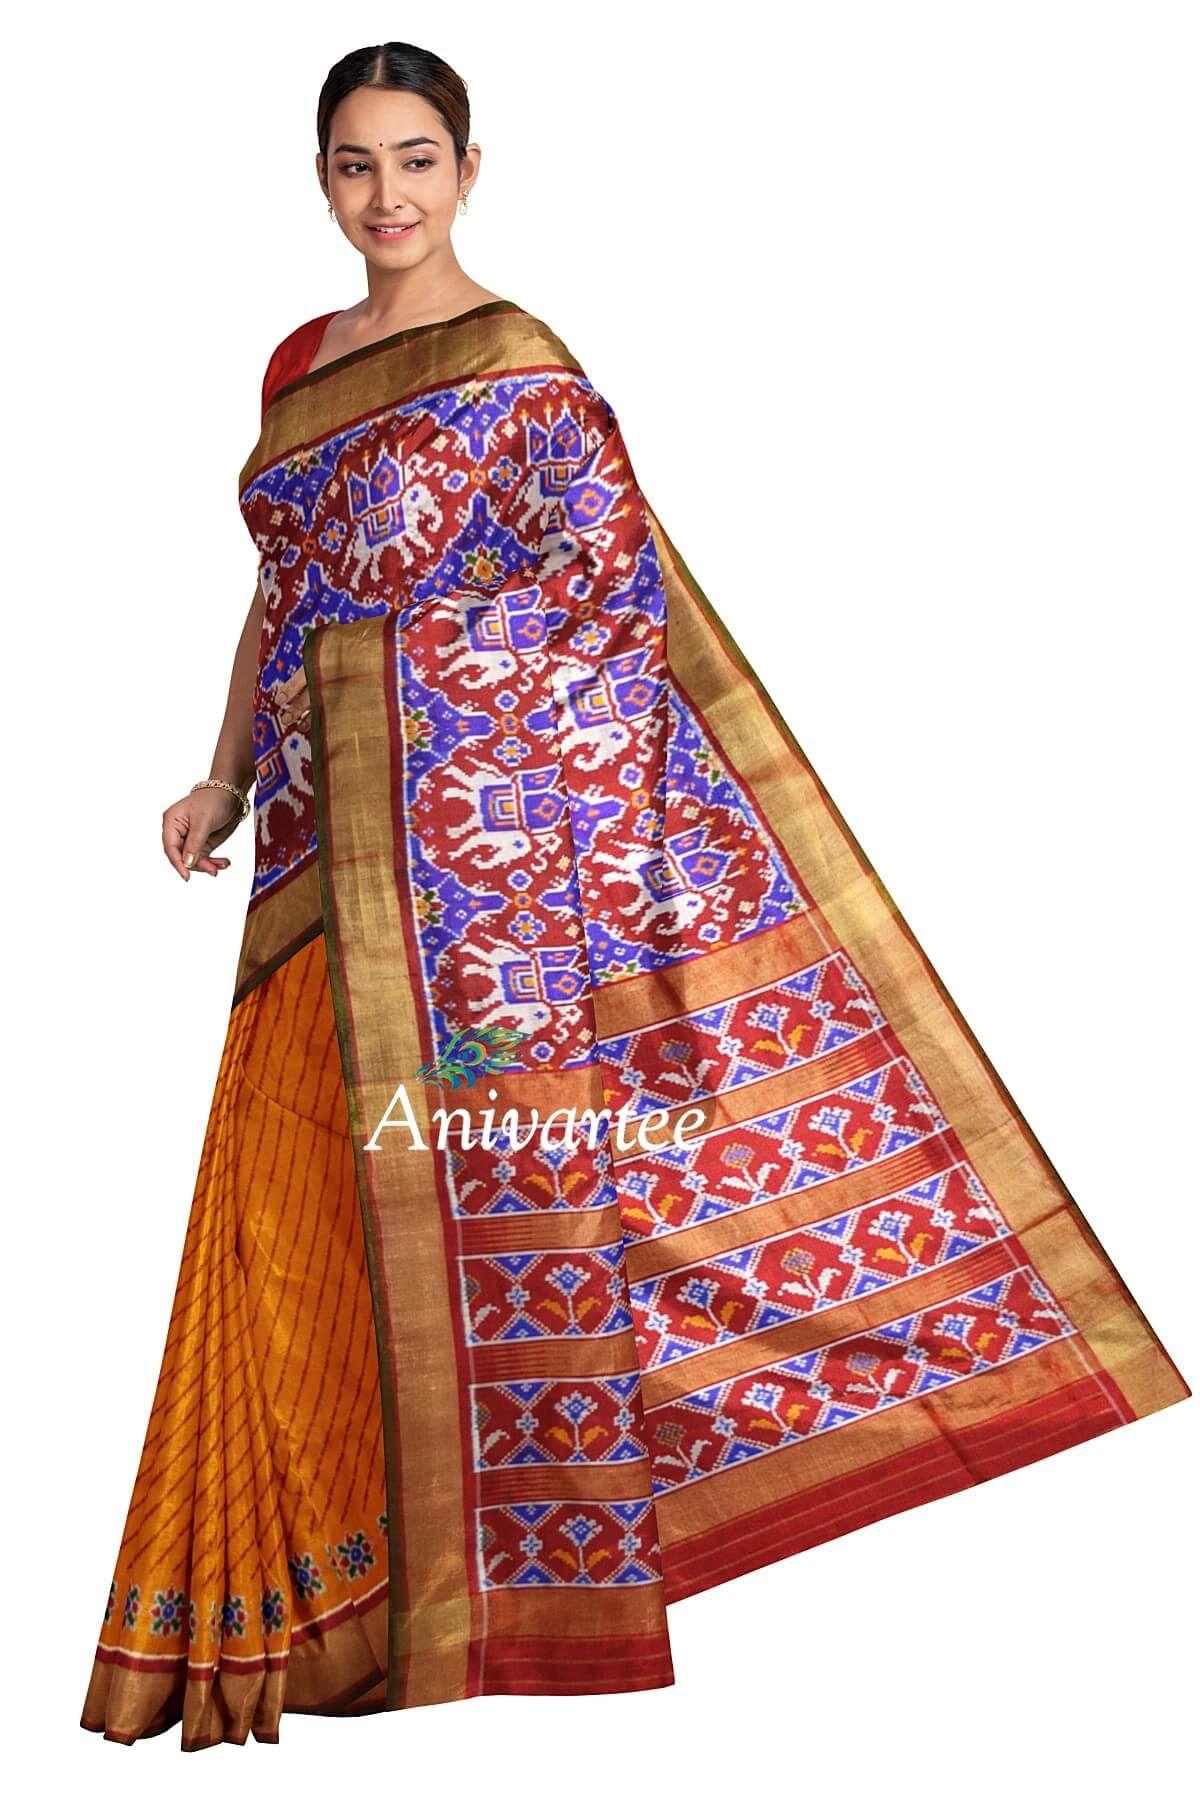 Handwoven-ikat-pure-silk-saree-in-partly-style-with-kunj-in-chabadi......   +91 87921 77606.....   www.anivartee.com......      #anivartee #anivarteesarees #saree #sareesusa #sareeuk #sareesoverseas #sareebangalore #sareeswag #handloom #indianwear #weaversofinstagram #sareeofinstagram #sareechicago #designersaree #ethnicwear #indianbride #indianwedding #desifashion bollywoodstyle #indian #lehenga #ikkat #ikkatsilksaree #wedmegood